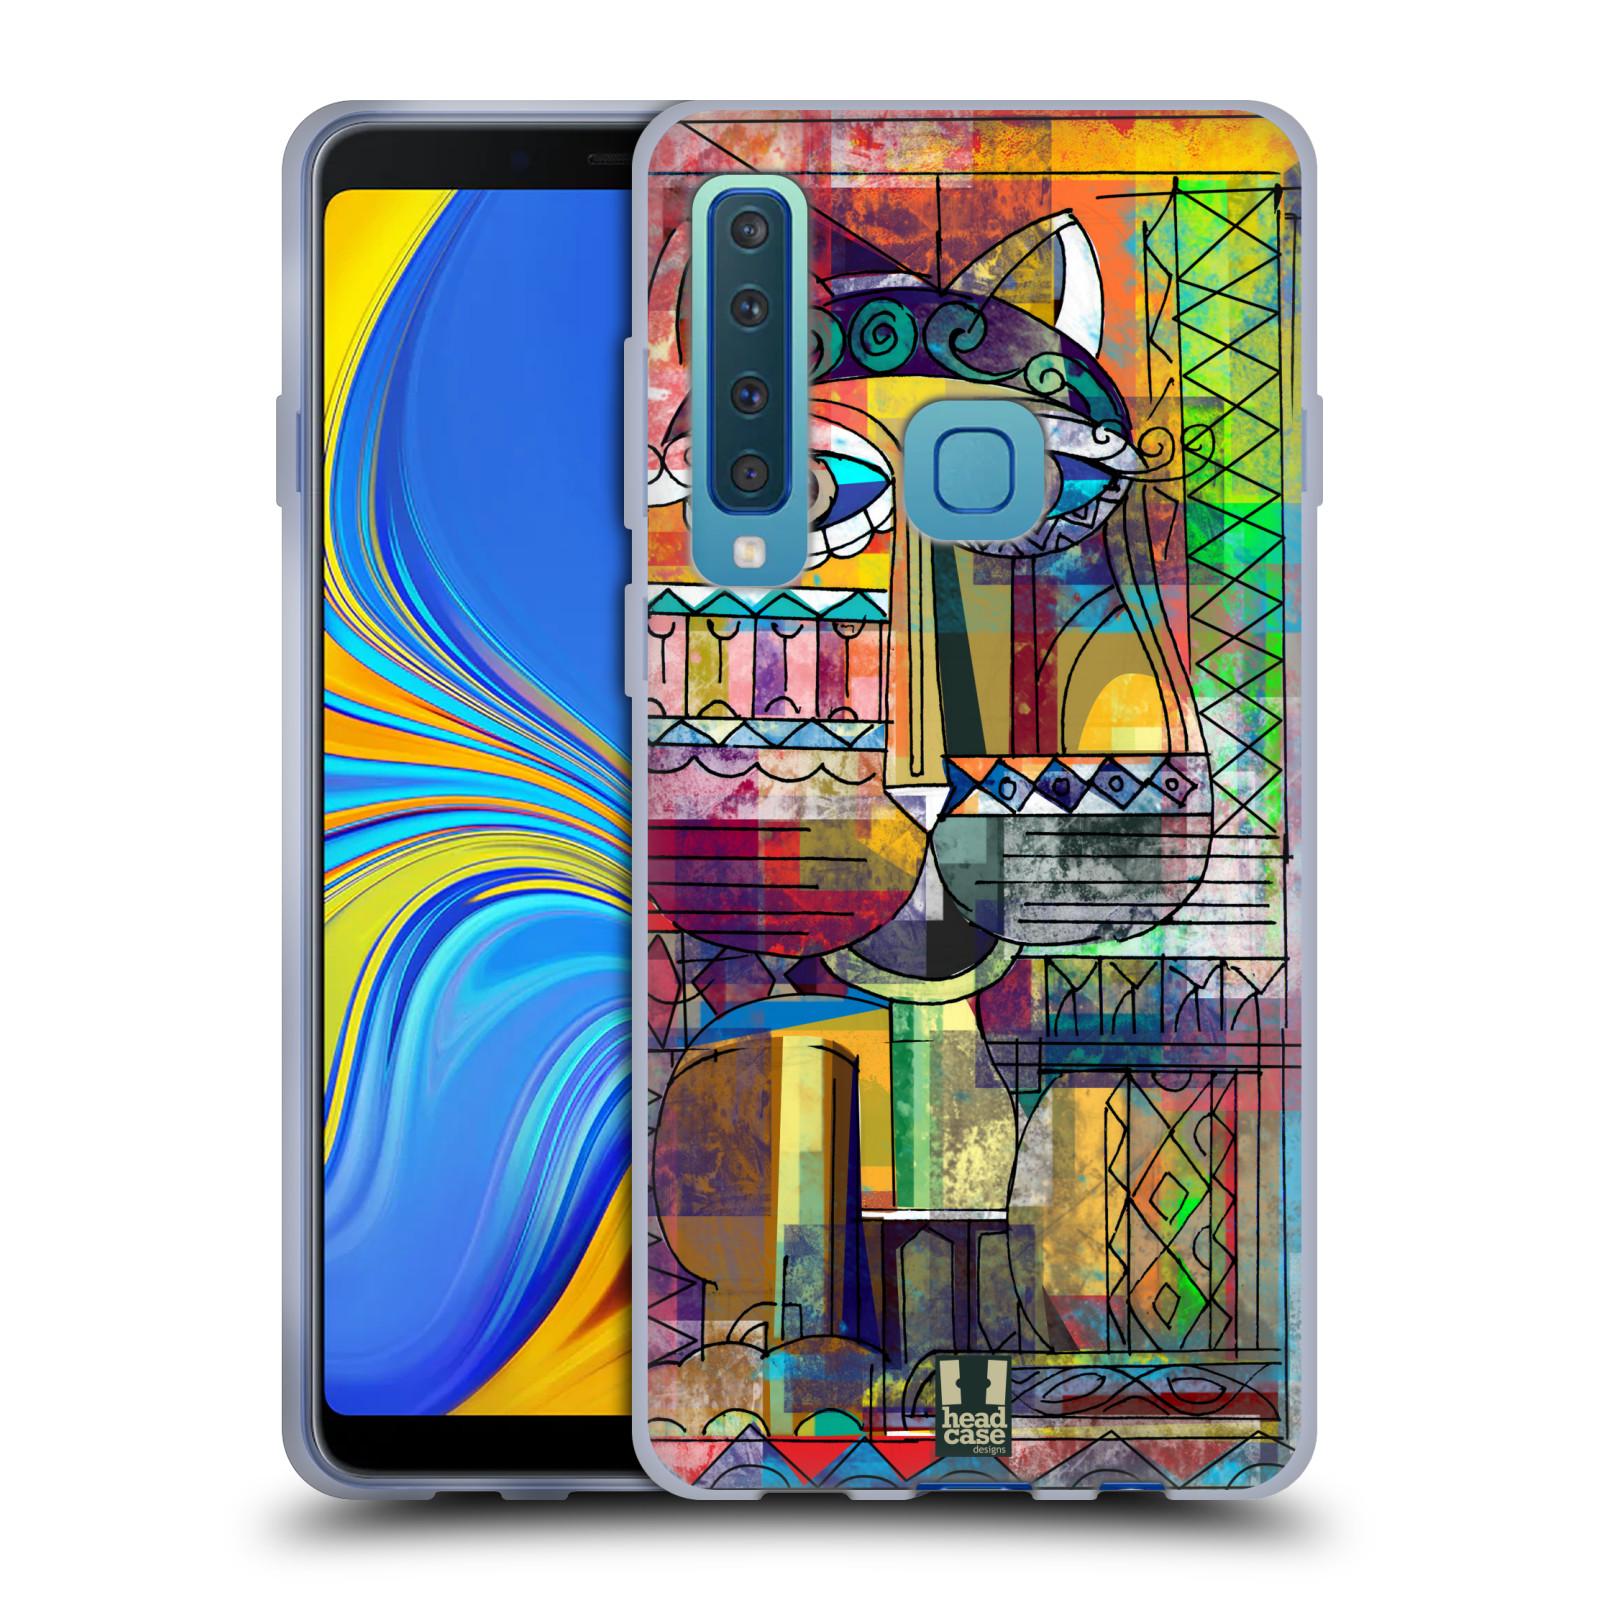 Silikonové pouzdro na mobil Samsung Galaxy A9 (2018) - Head Case - AZTEC KORAT